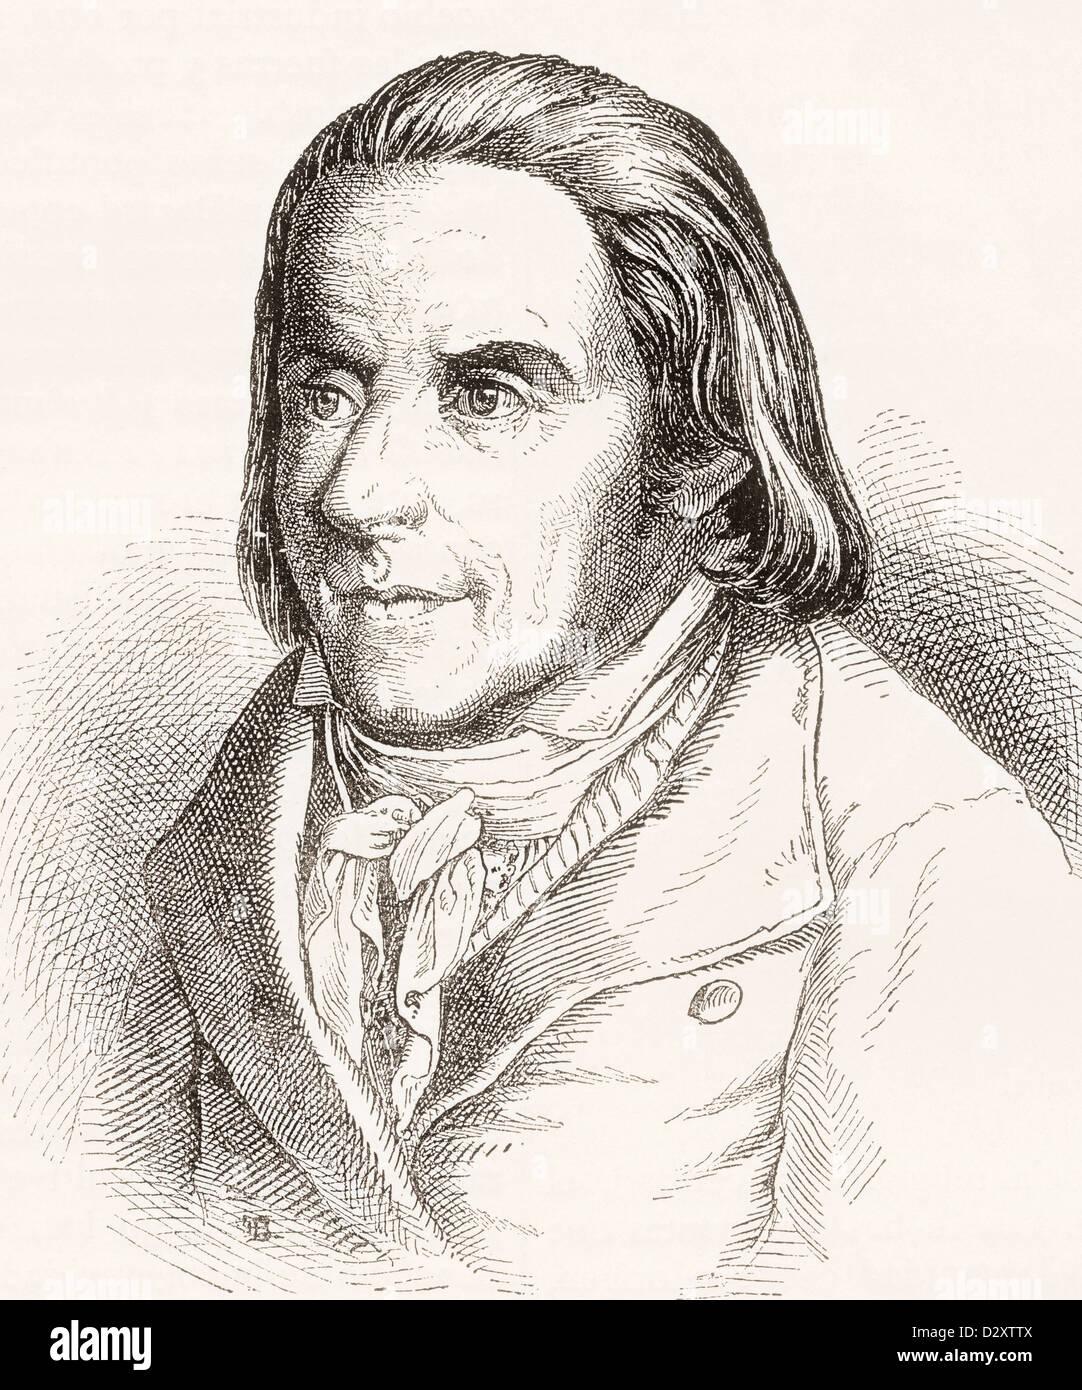 Johann Heinrich Pestalozzi, 1746 – 1827. Swiss pedagogue and educational reformer. - Stock Image